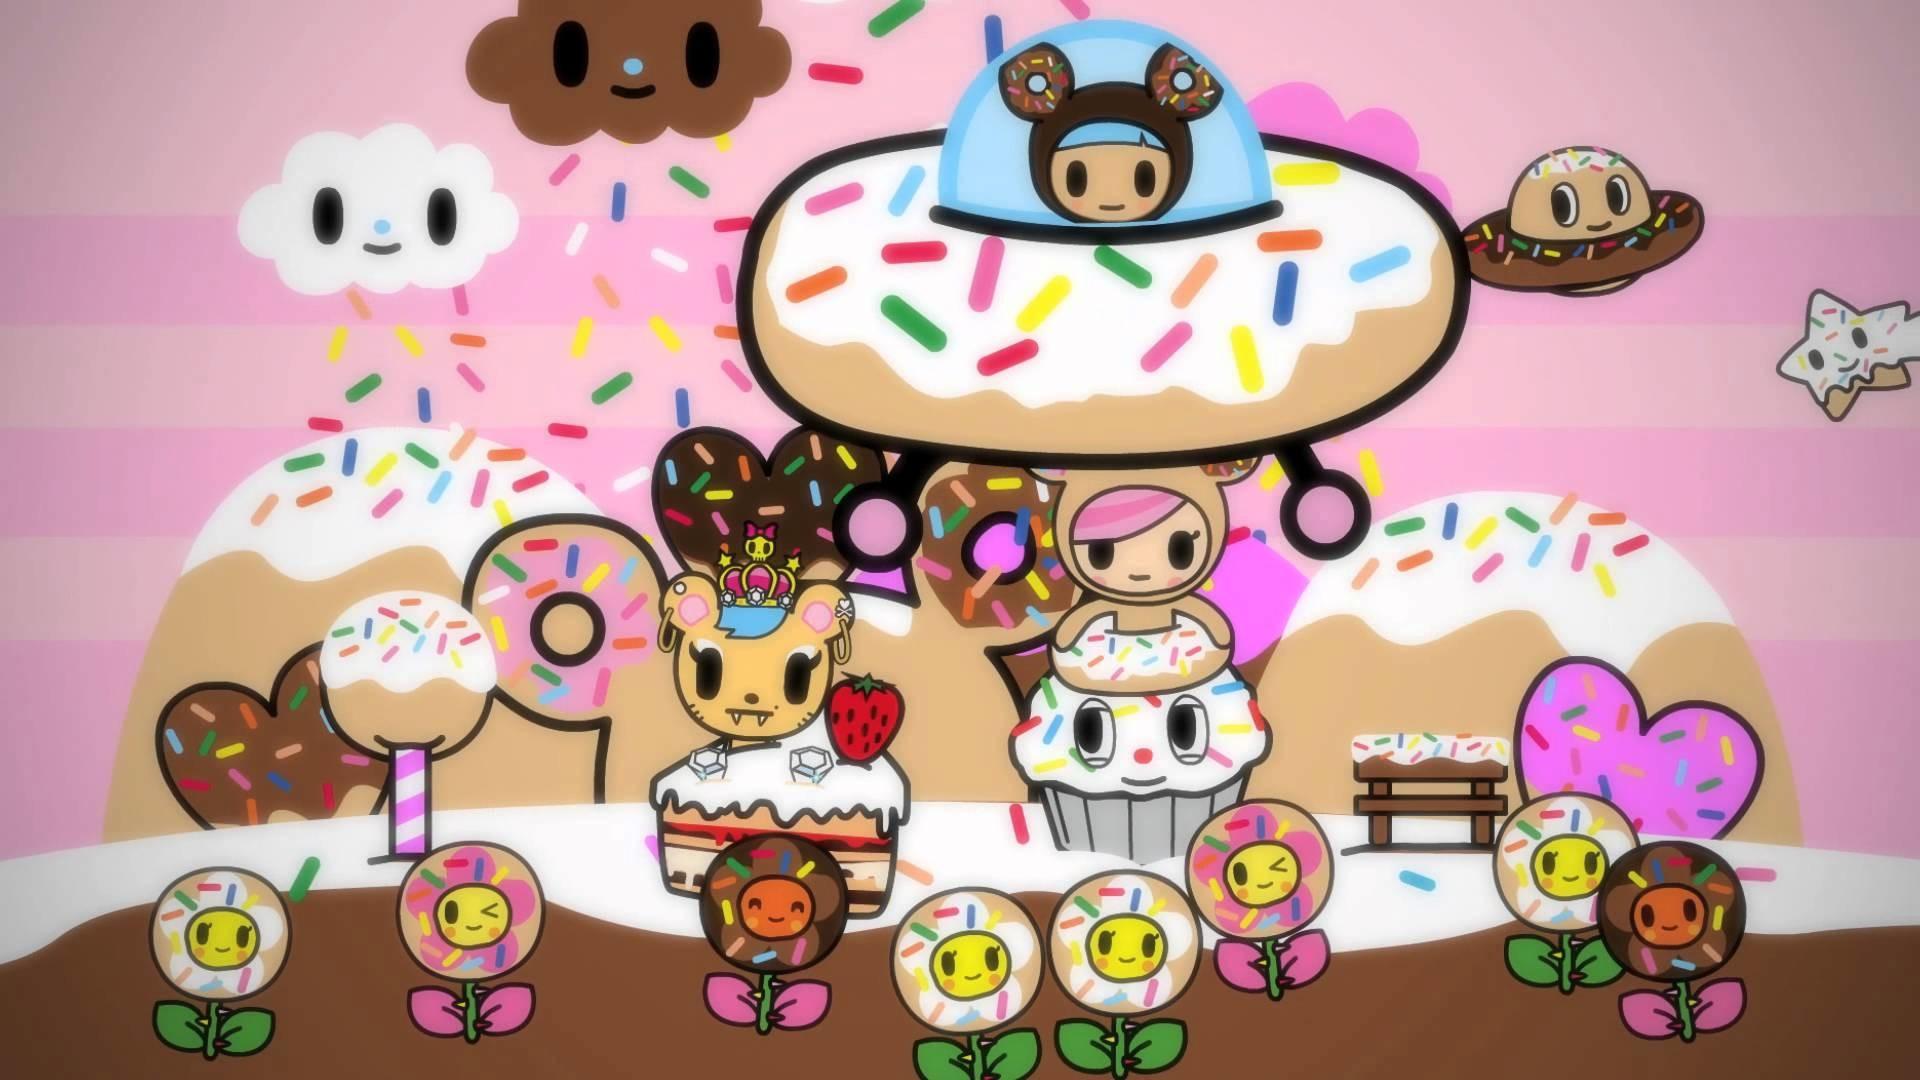 Cute Tokidoki Wallpaper Tokidoki Unicorno Wallpaper 183 ① Wallpapertag